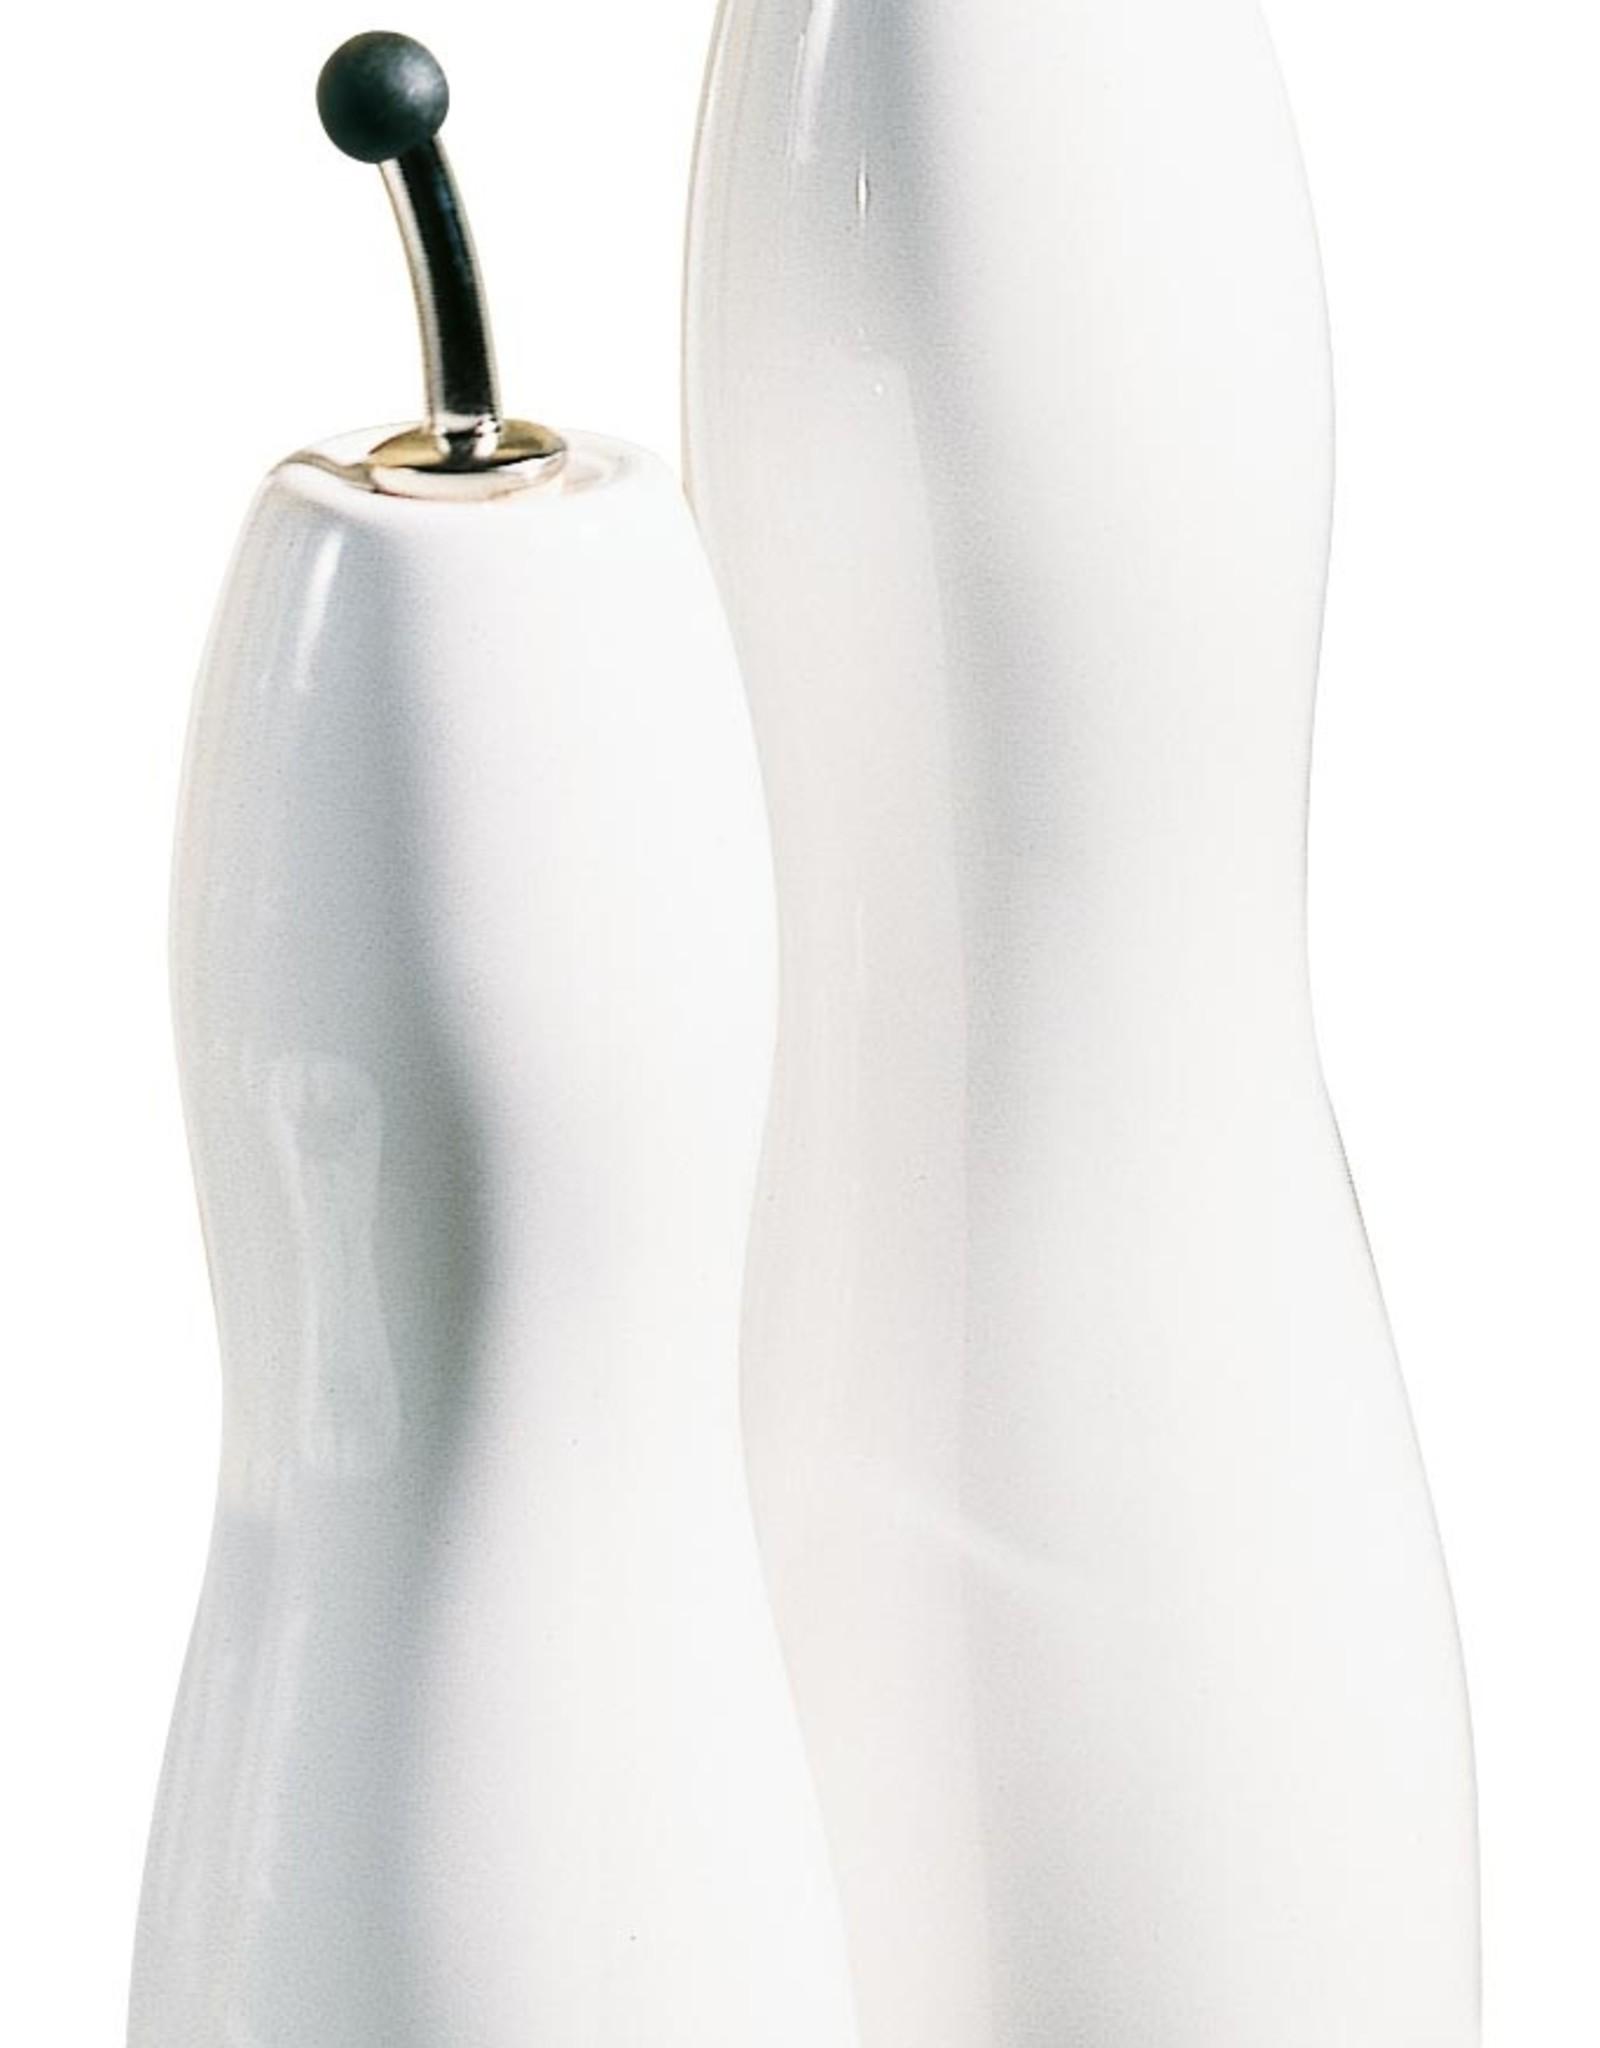 ASA ASA Olie- en Azijnfles Gegolfd Porselein Wit 0.75L